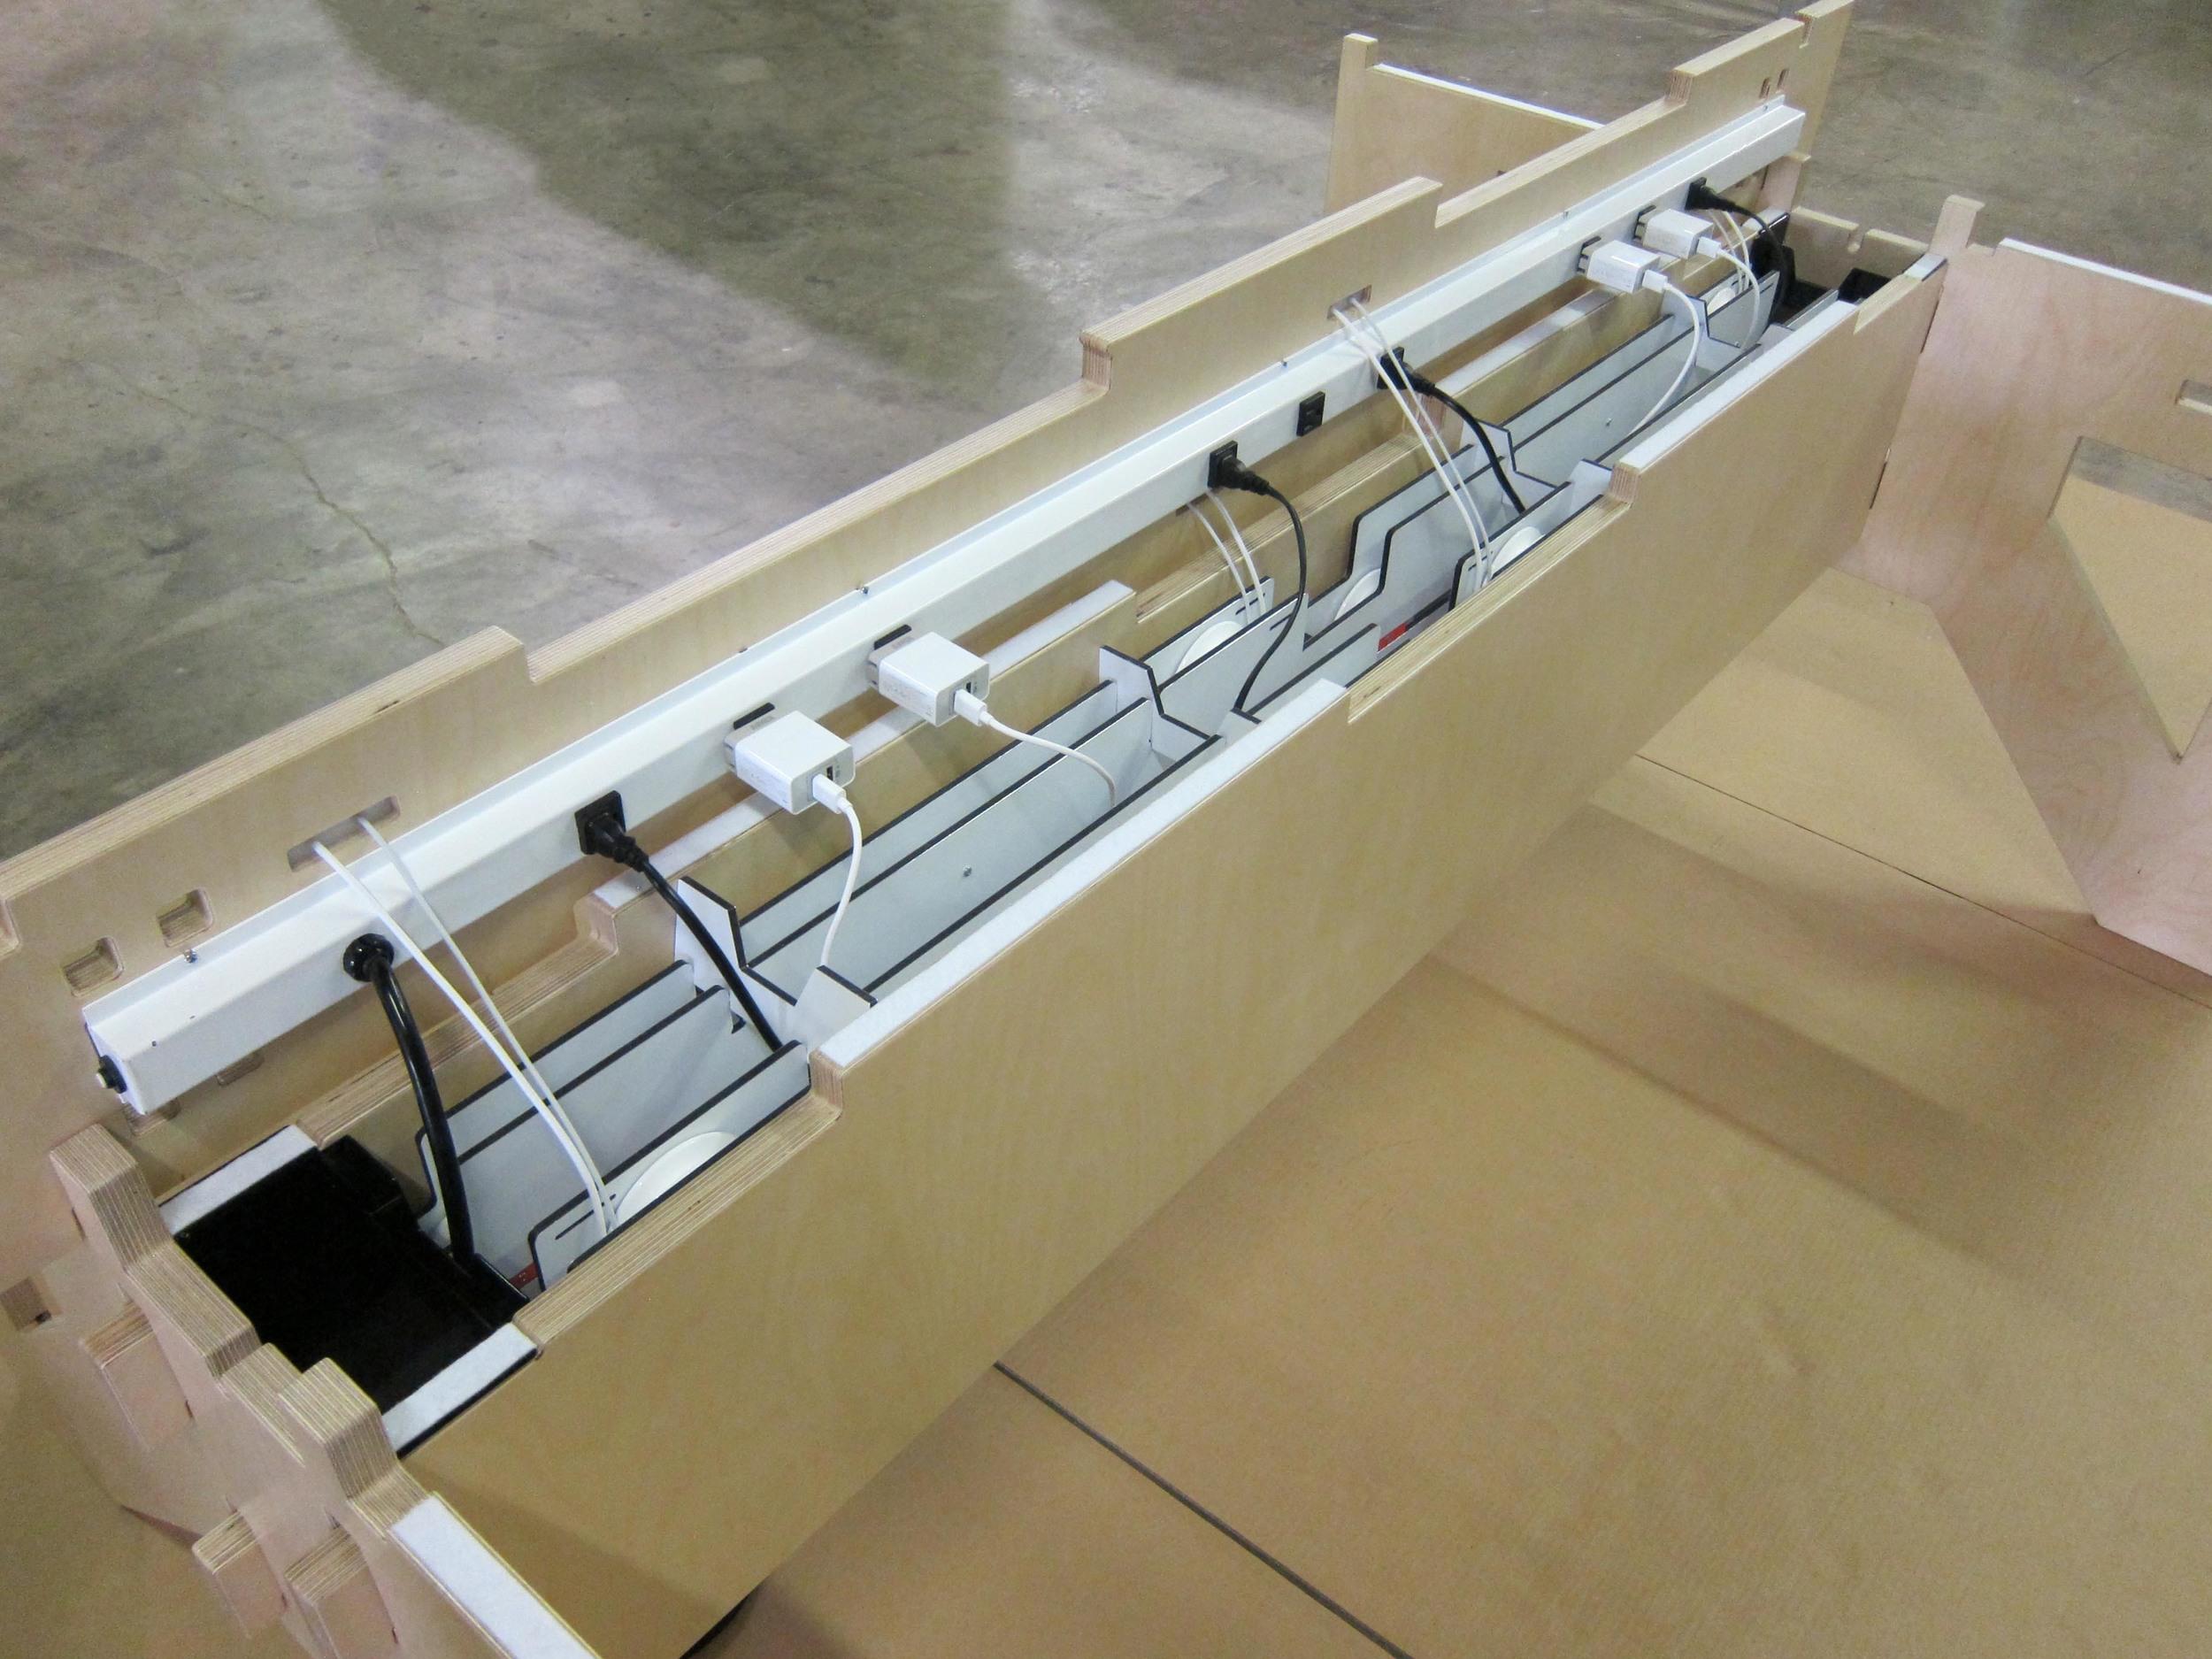 Power strip installed in Klevr WELD Table